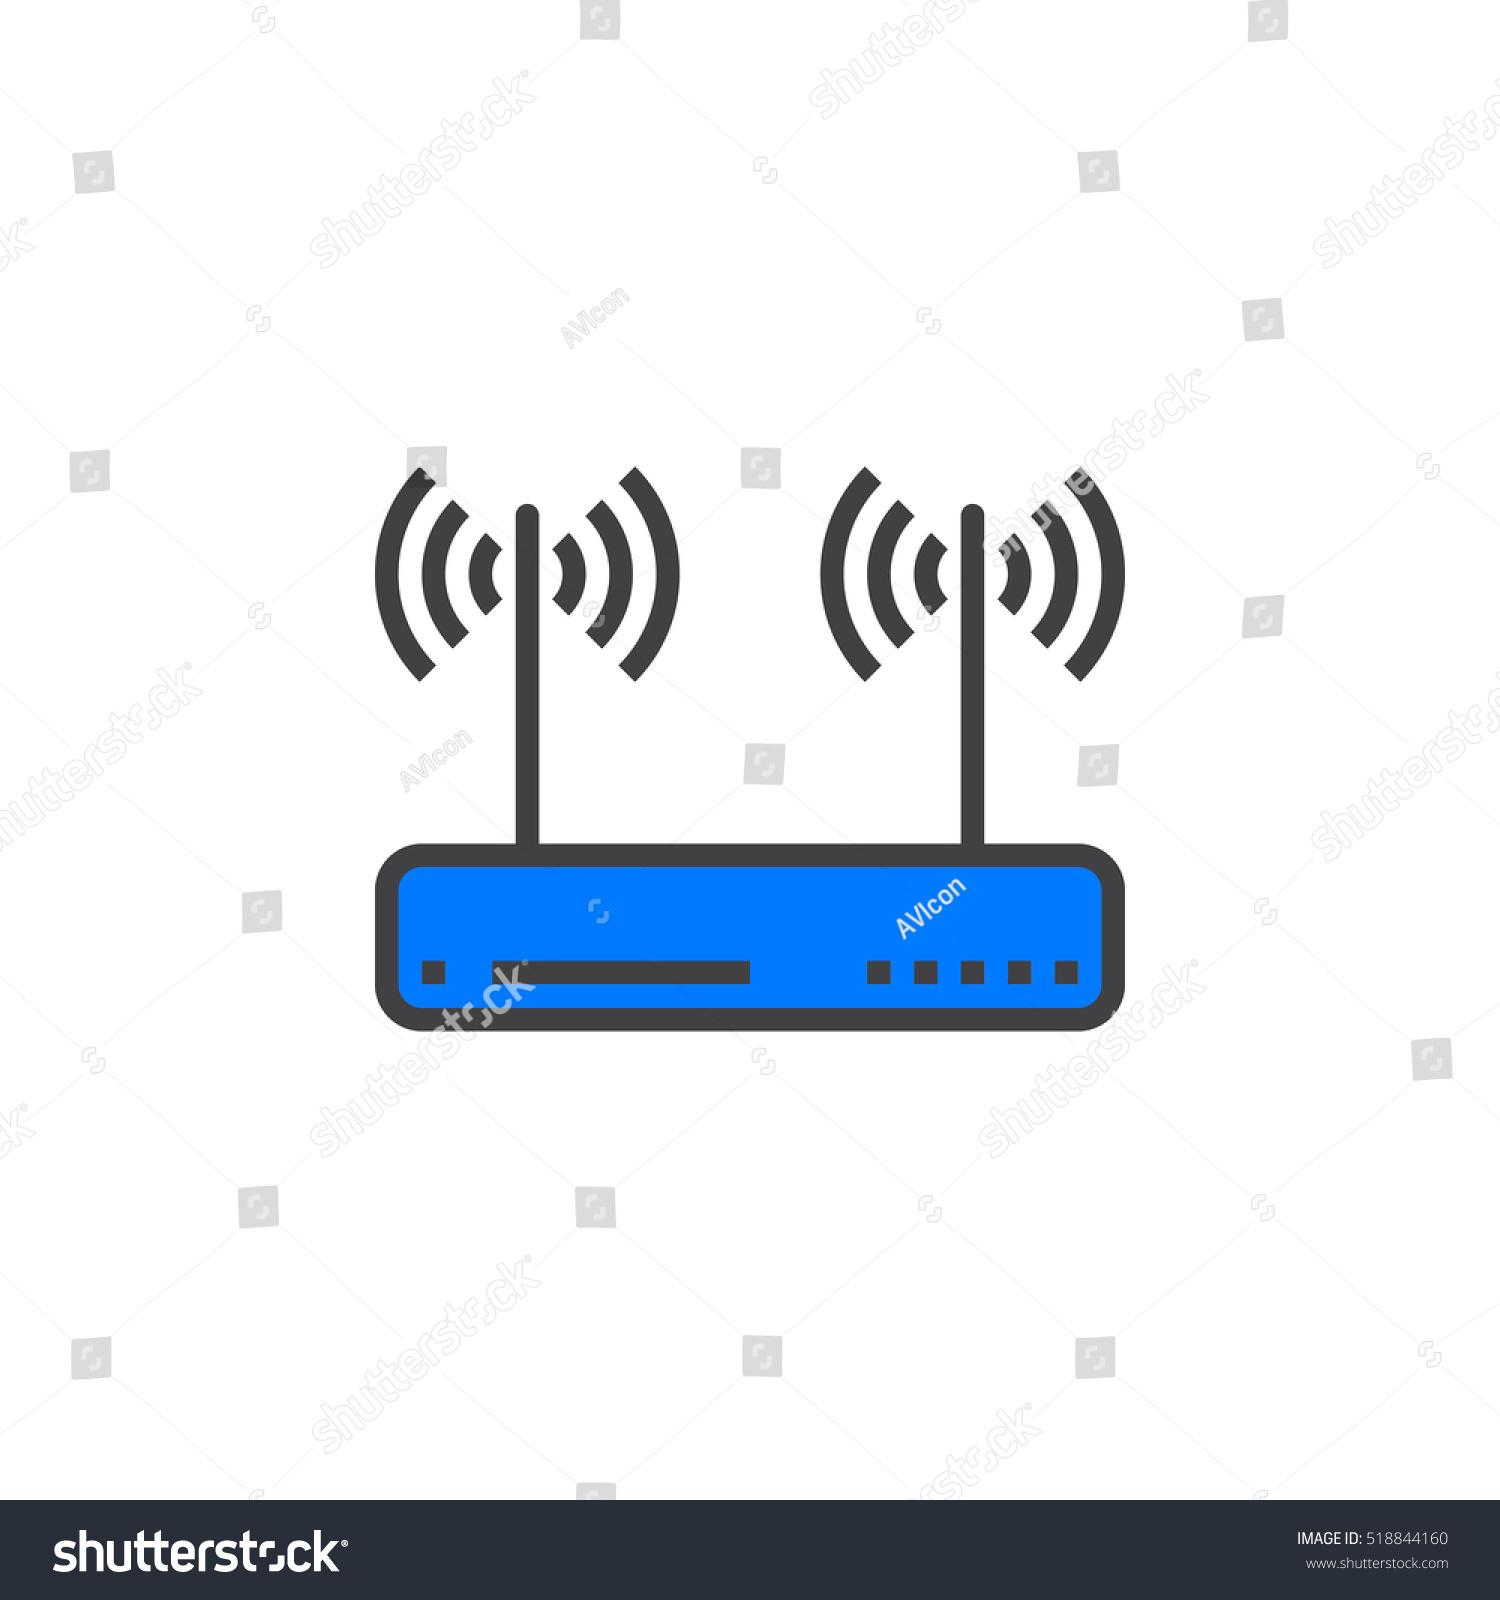 Netgear Router And Modem Wiring Diagram